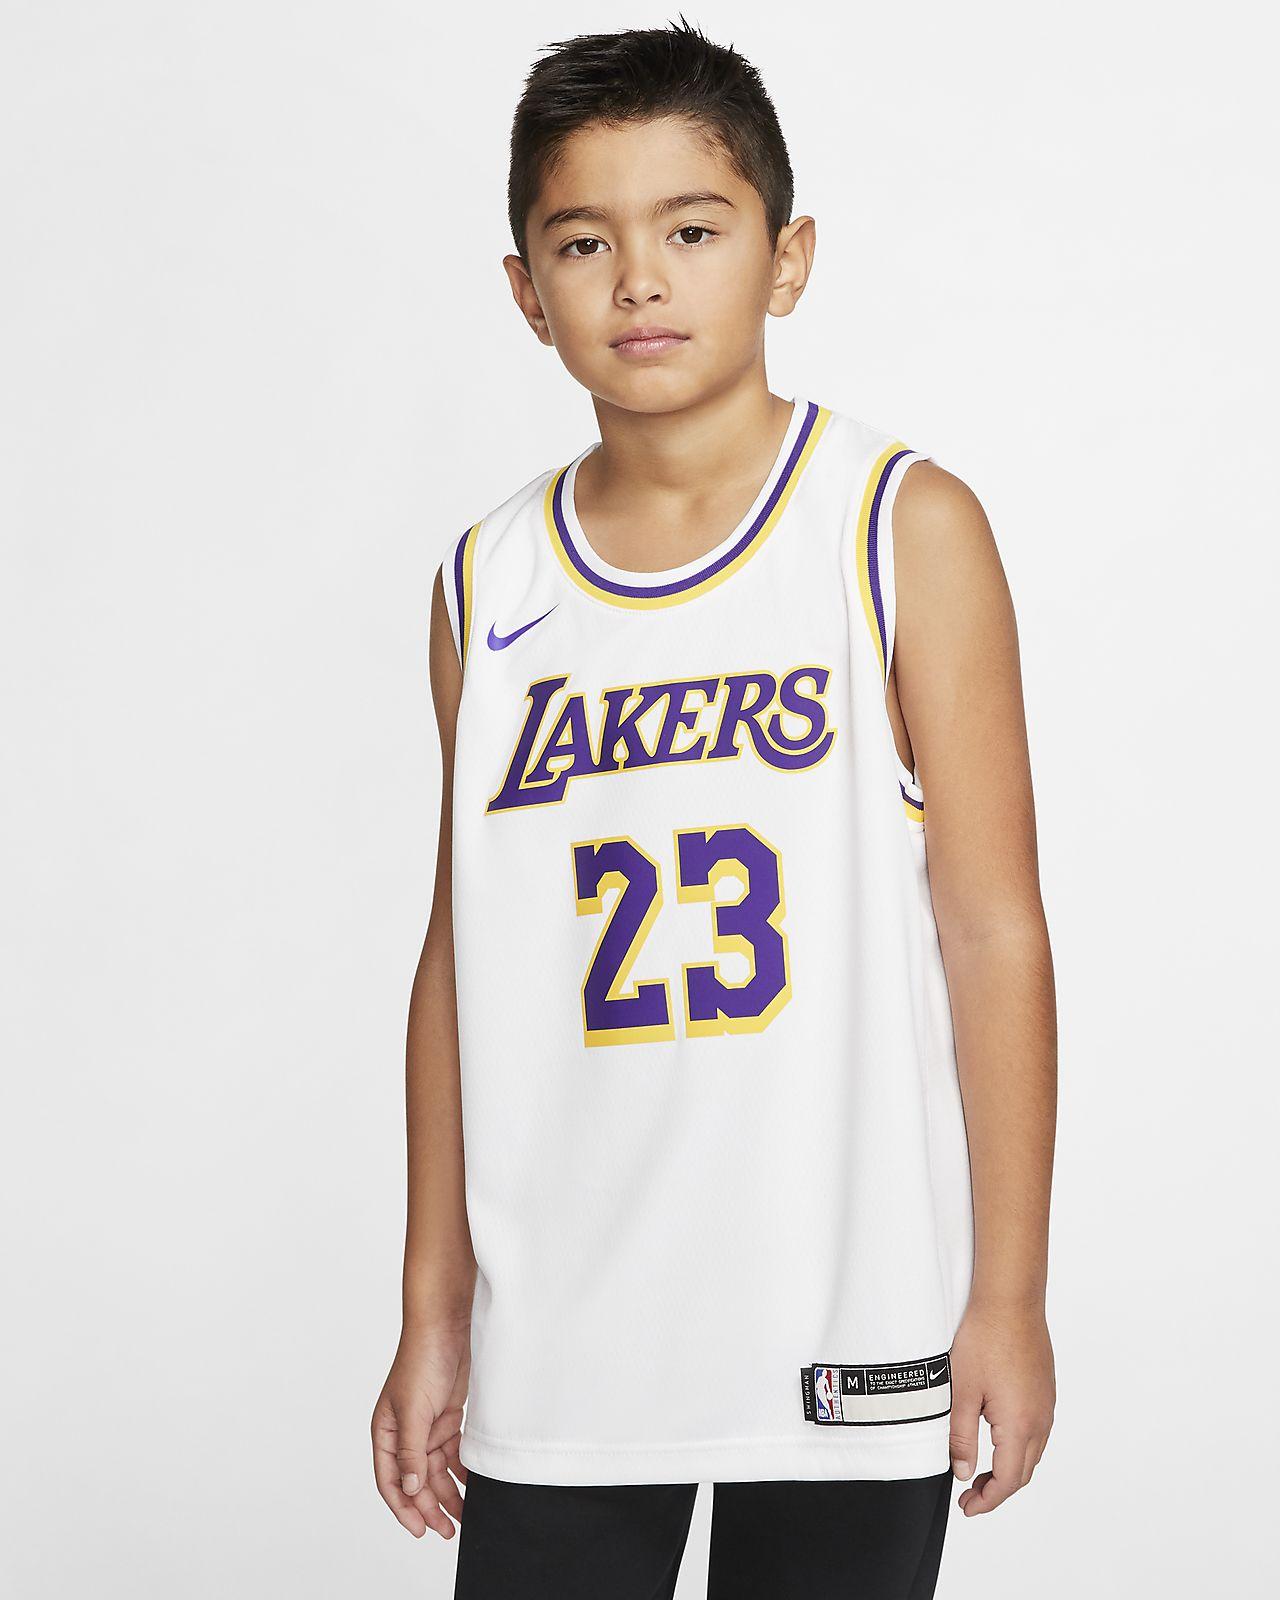 LeBron James Association Edition Swingman Jersey (Los Angeles Lakers) NBA-jersey voor kids